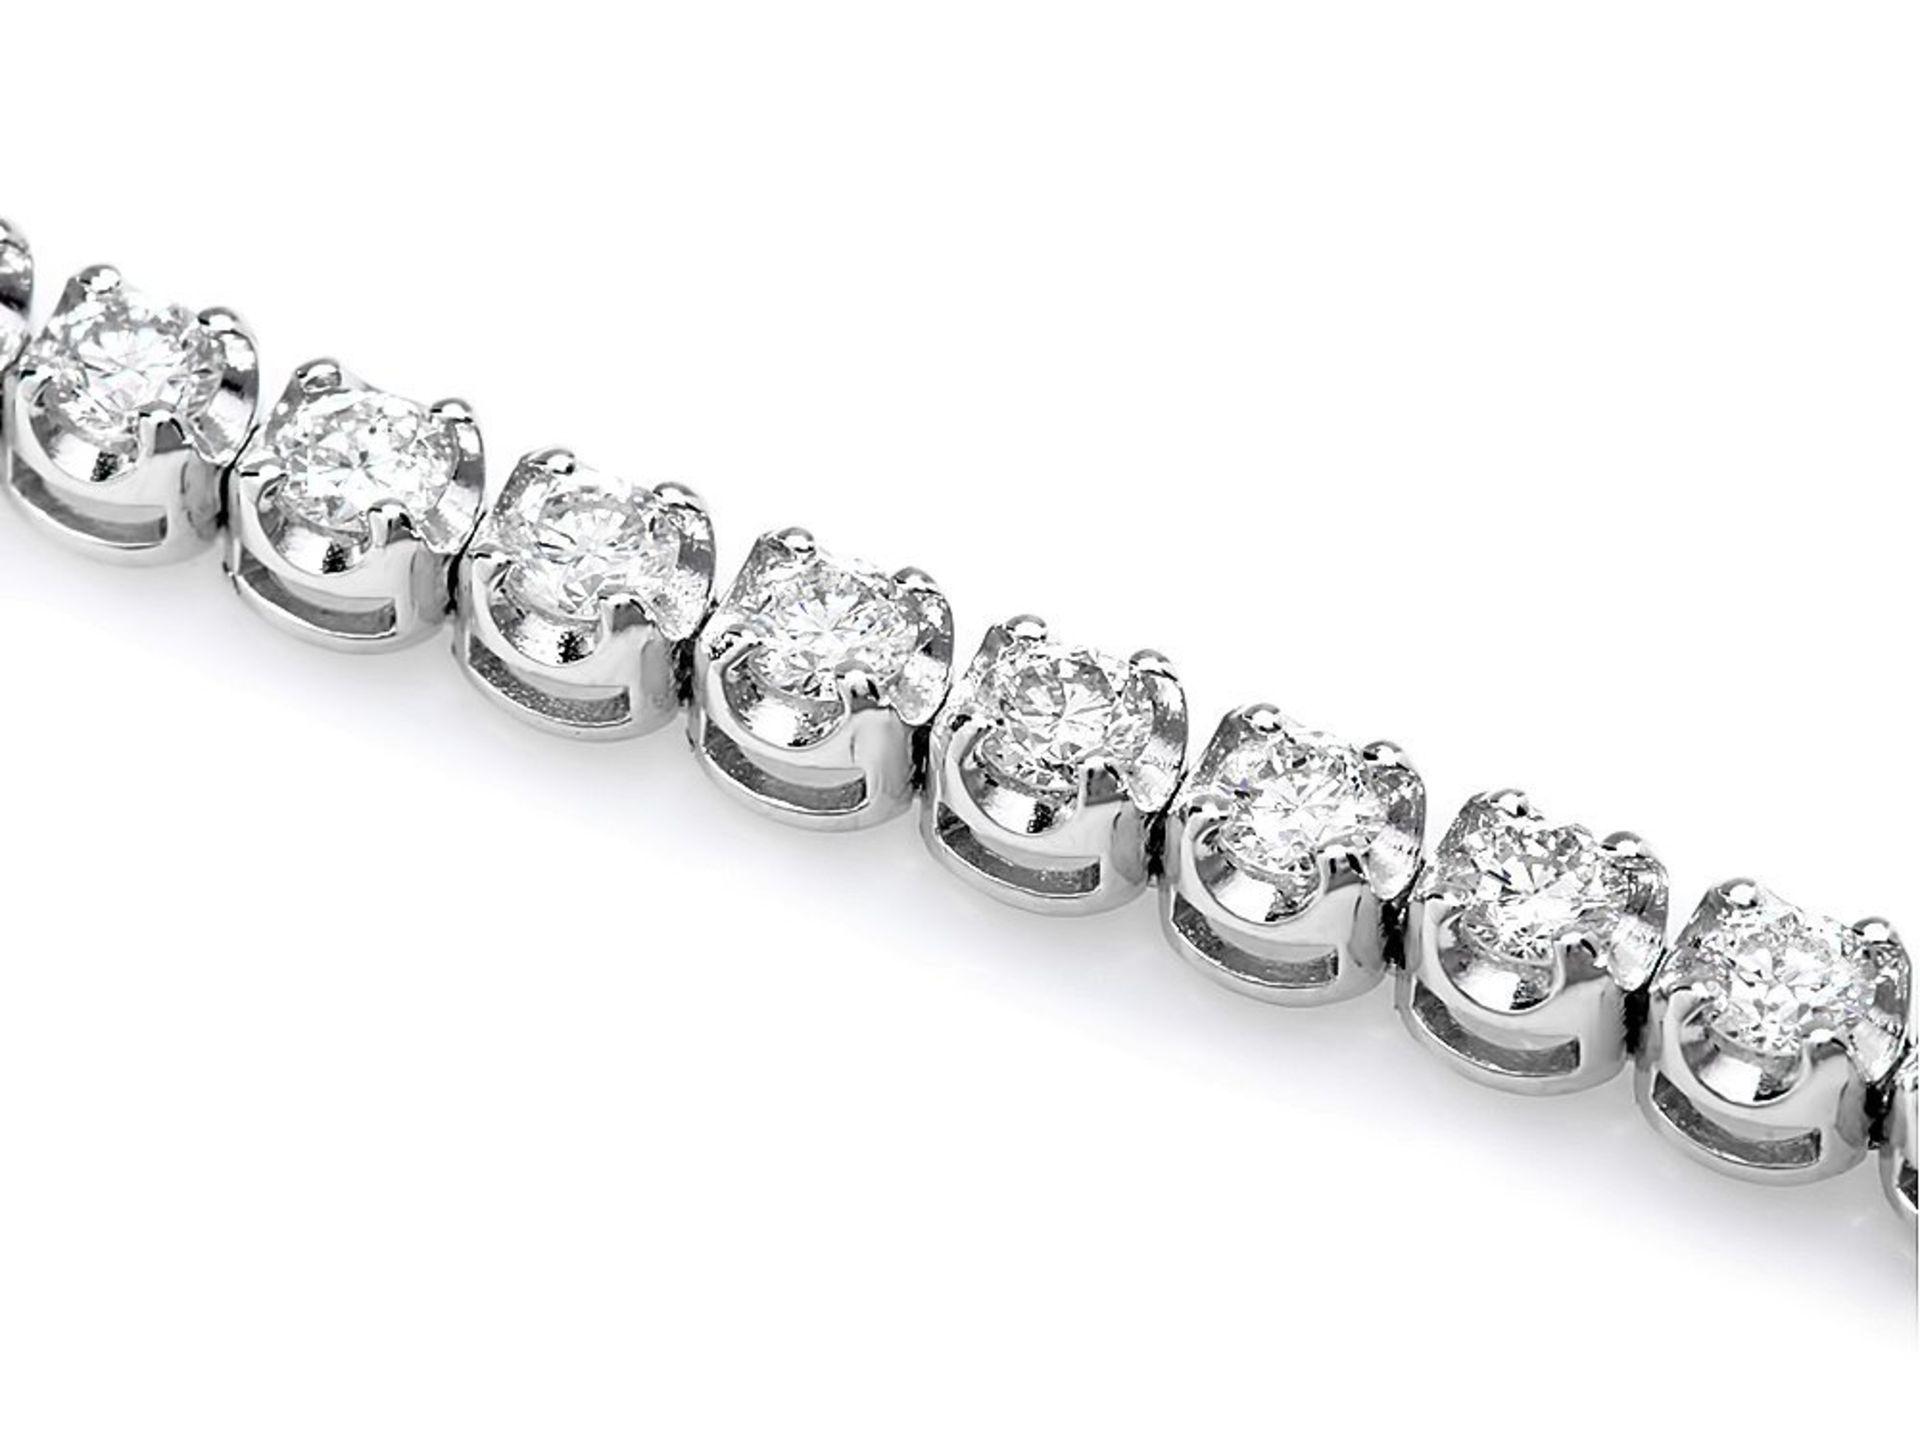 18k White Gold 3.00ct Diamond Bracelet - Image 2 of 4